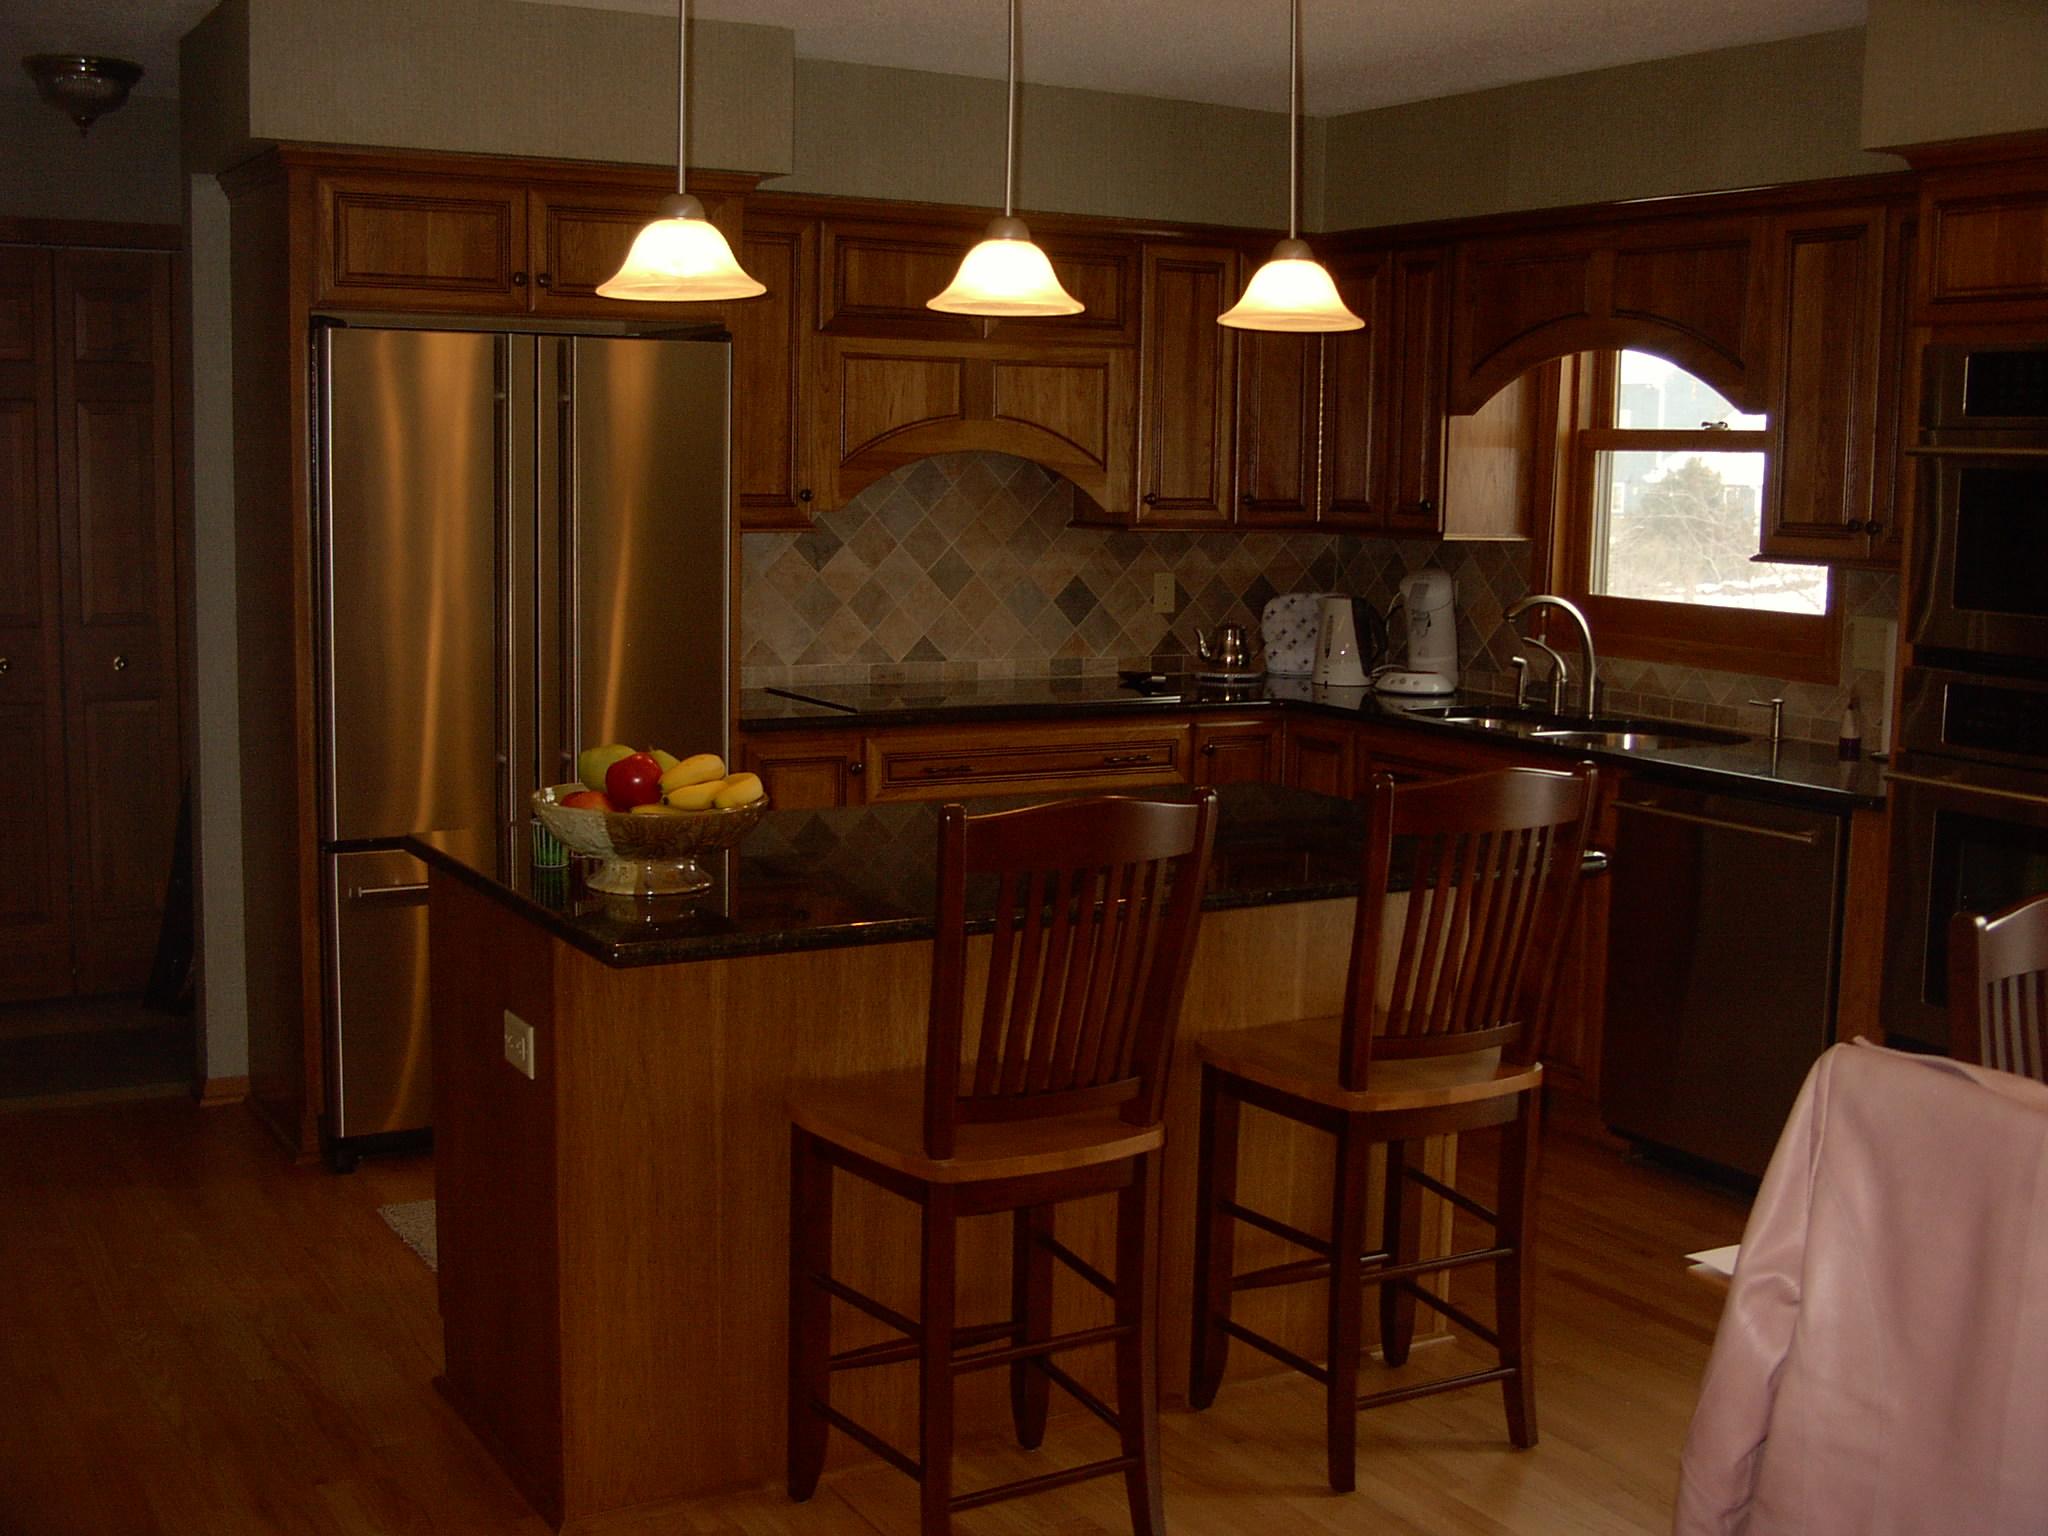 kitchen renovation kitchen remodeling manassas va Tina 39 S Kitchen And Bath Remodeling Weblog Kitchen And Bath Interior